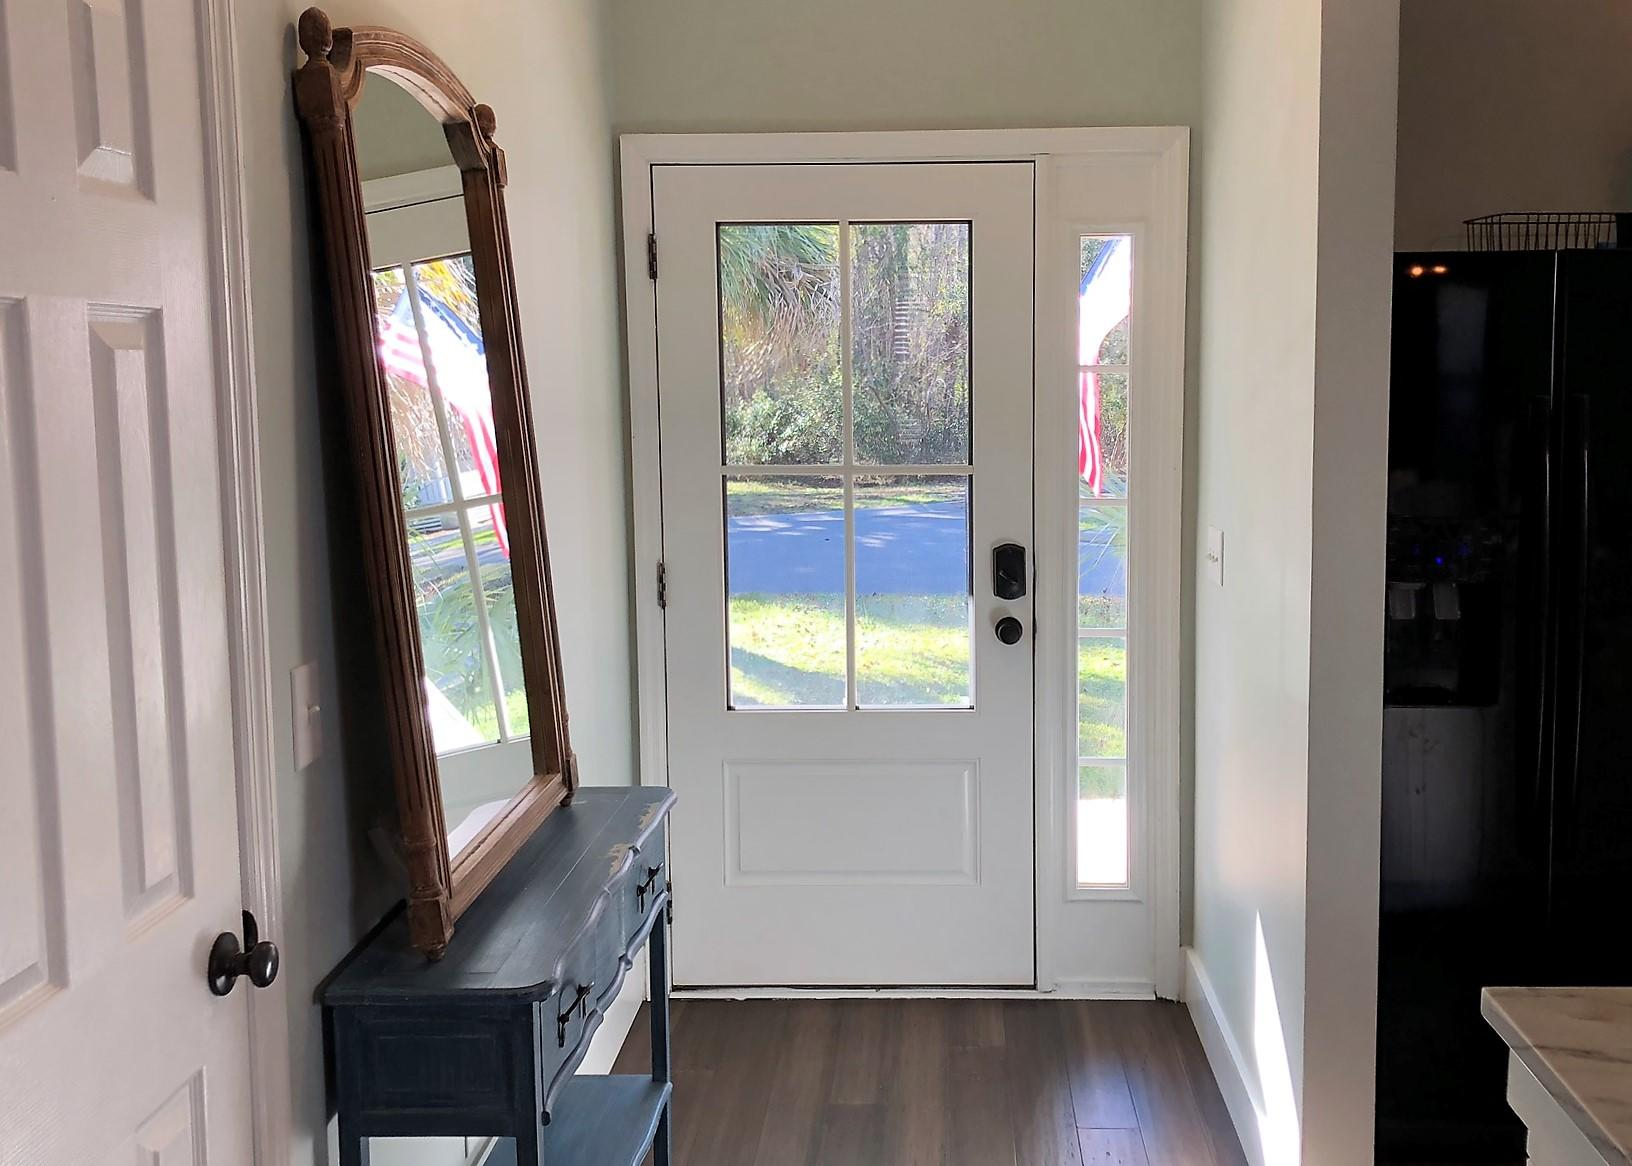 Fairway Villas Homes For Sale - 1542 Little Rock, Charleston, SC - 0